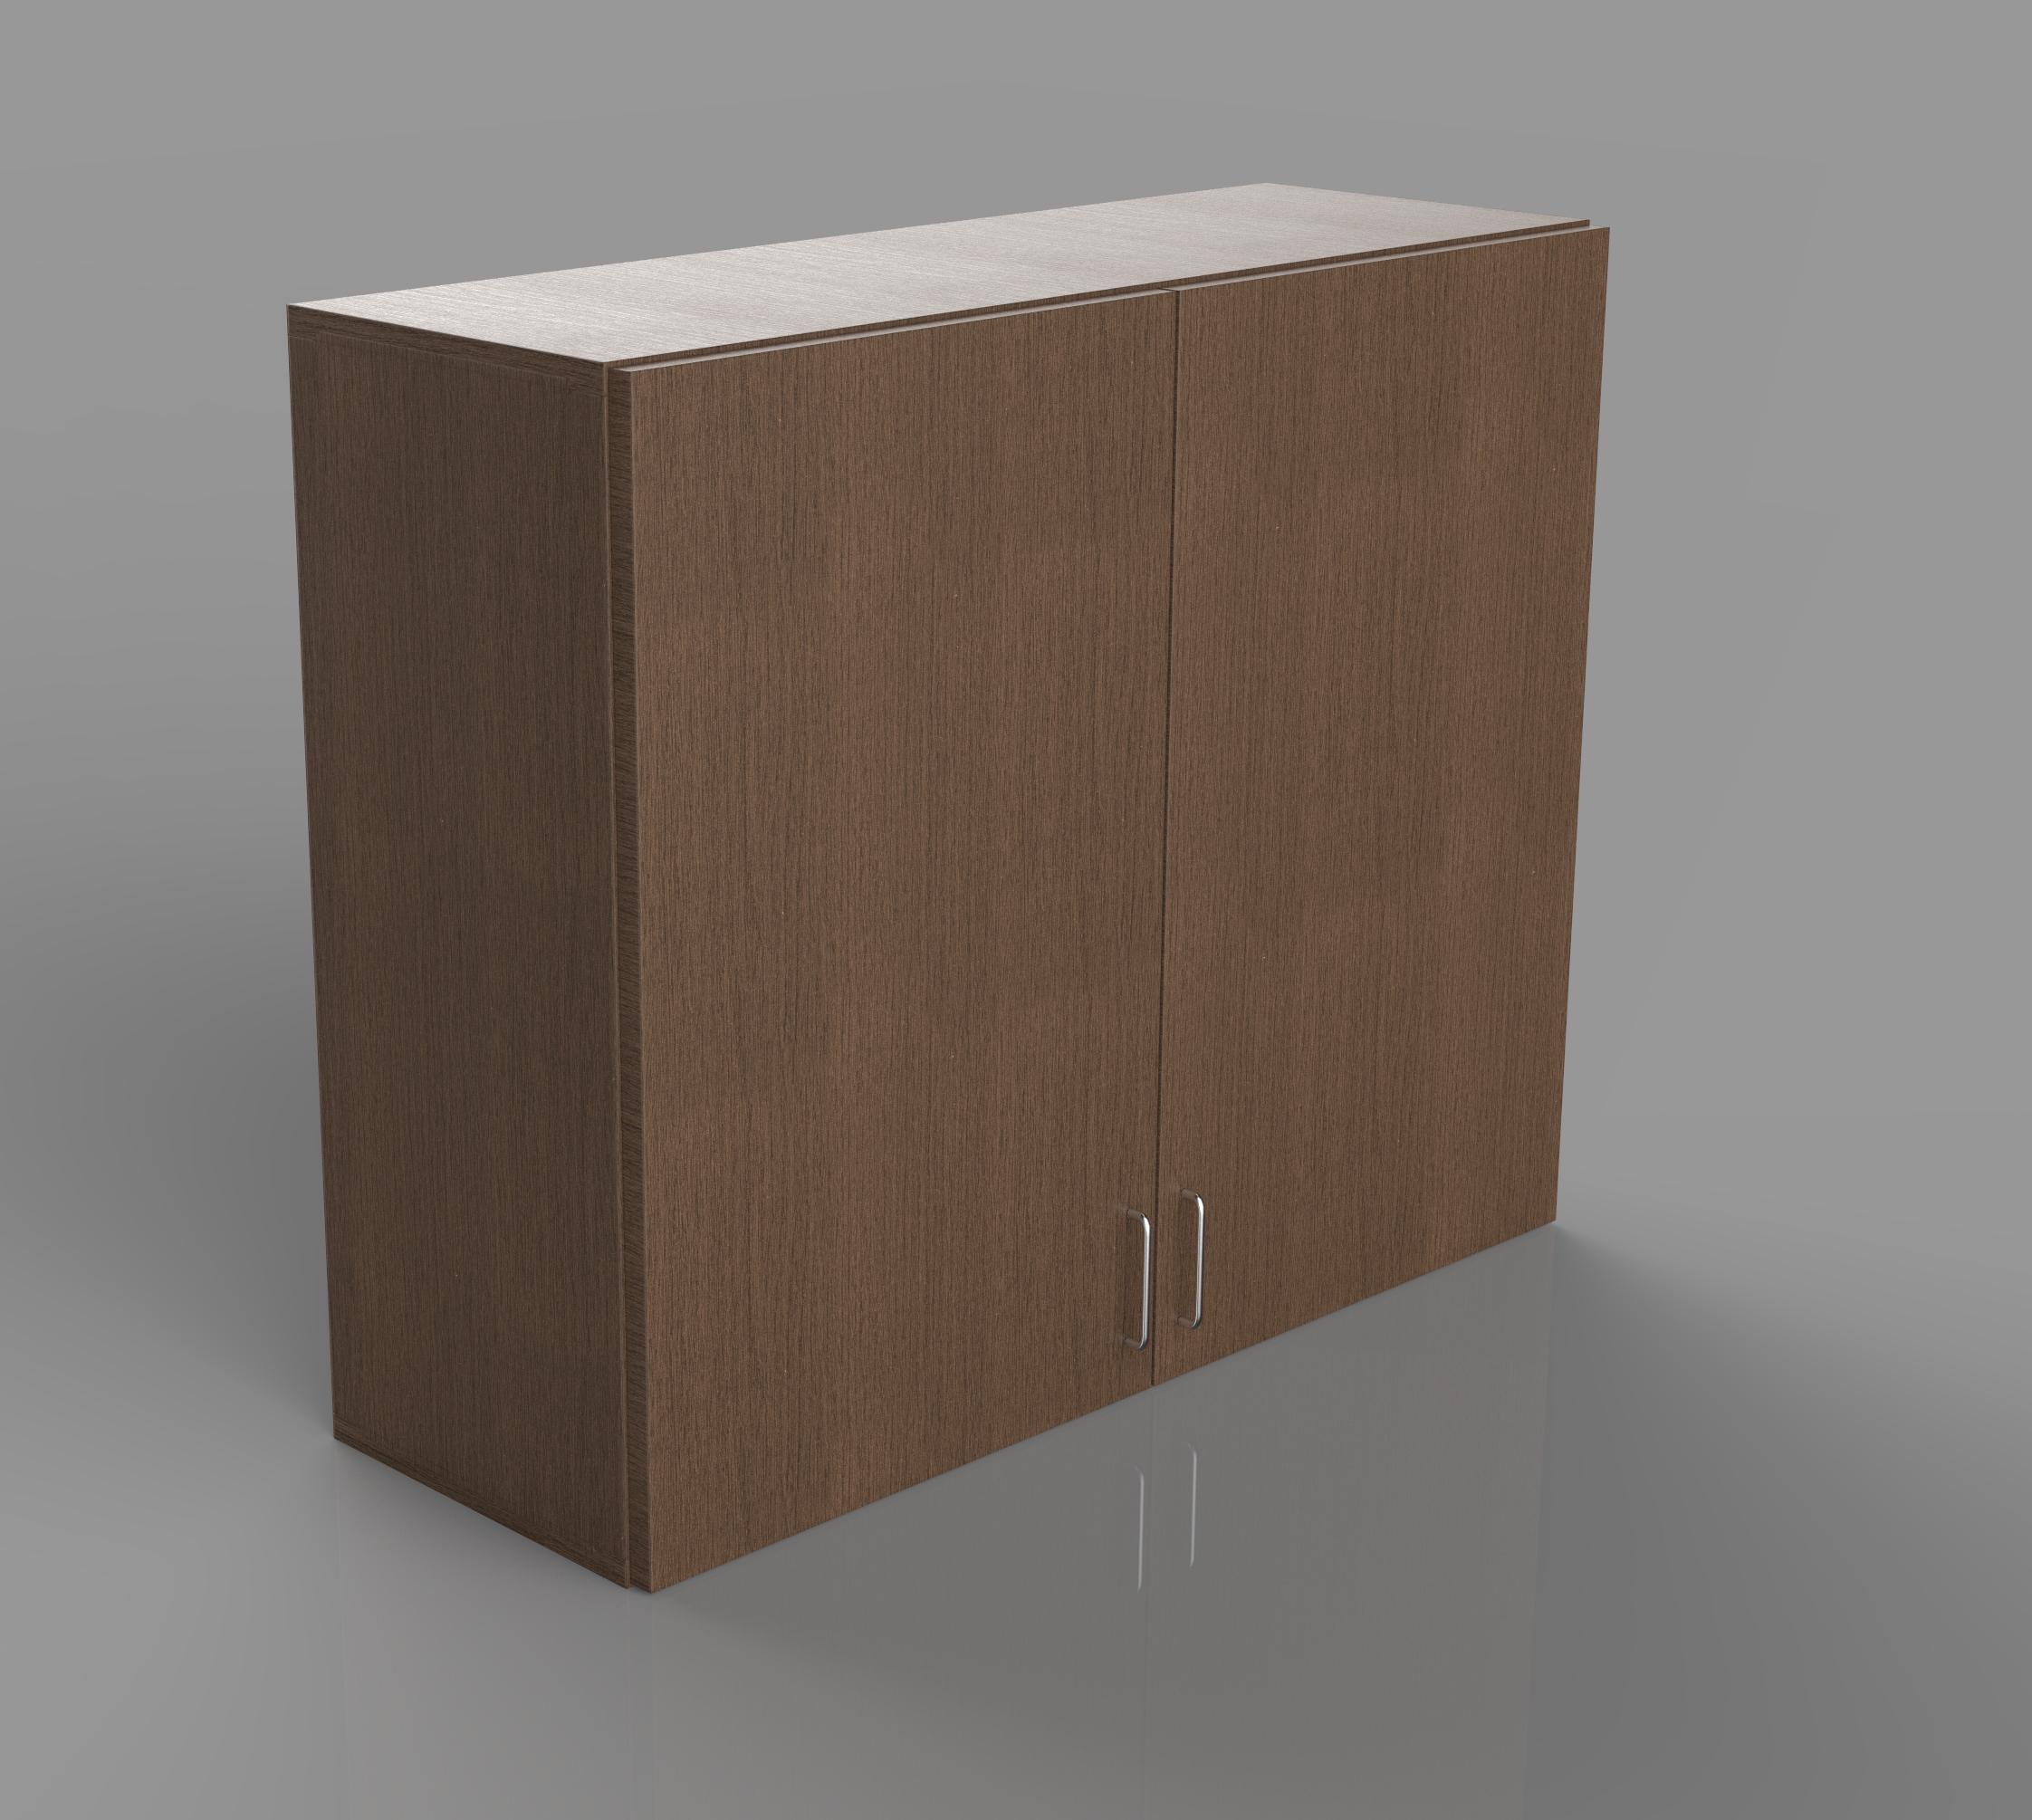 Example of a commercial double door upper cabinet